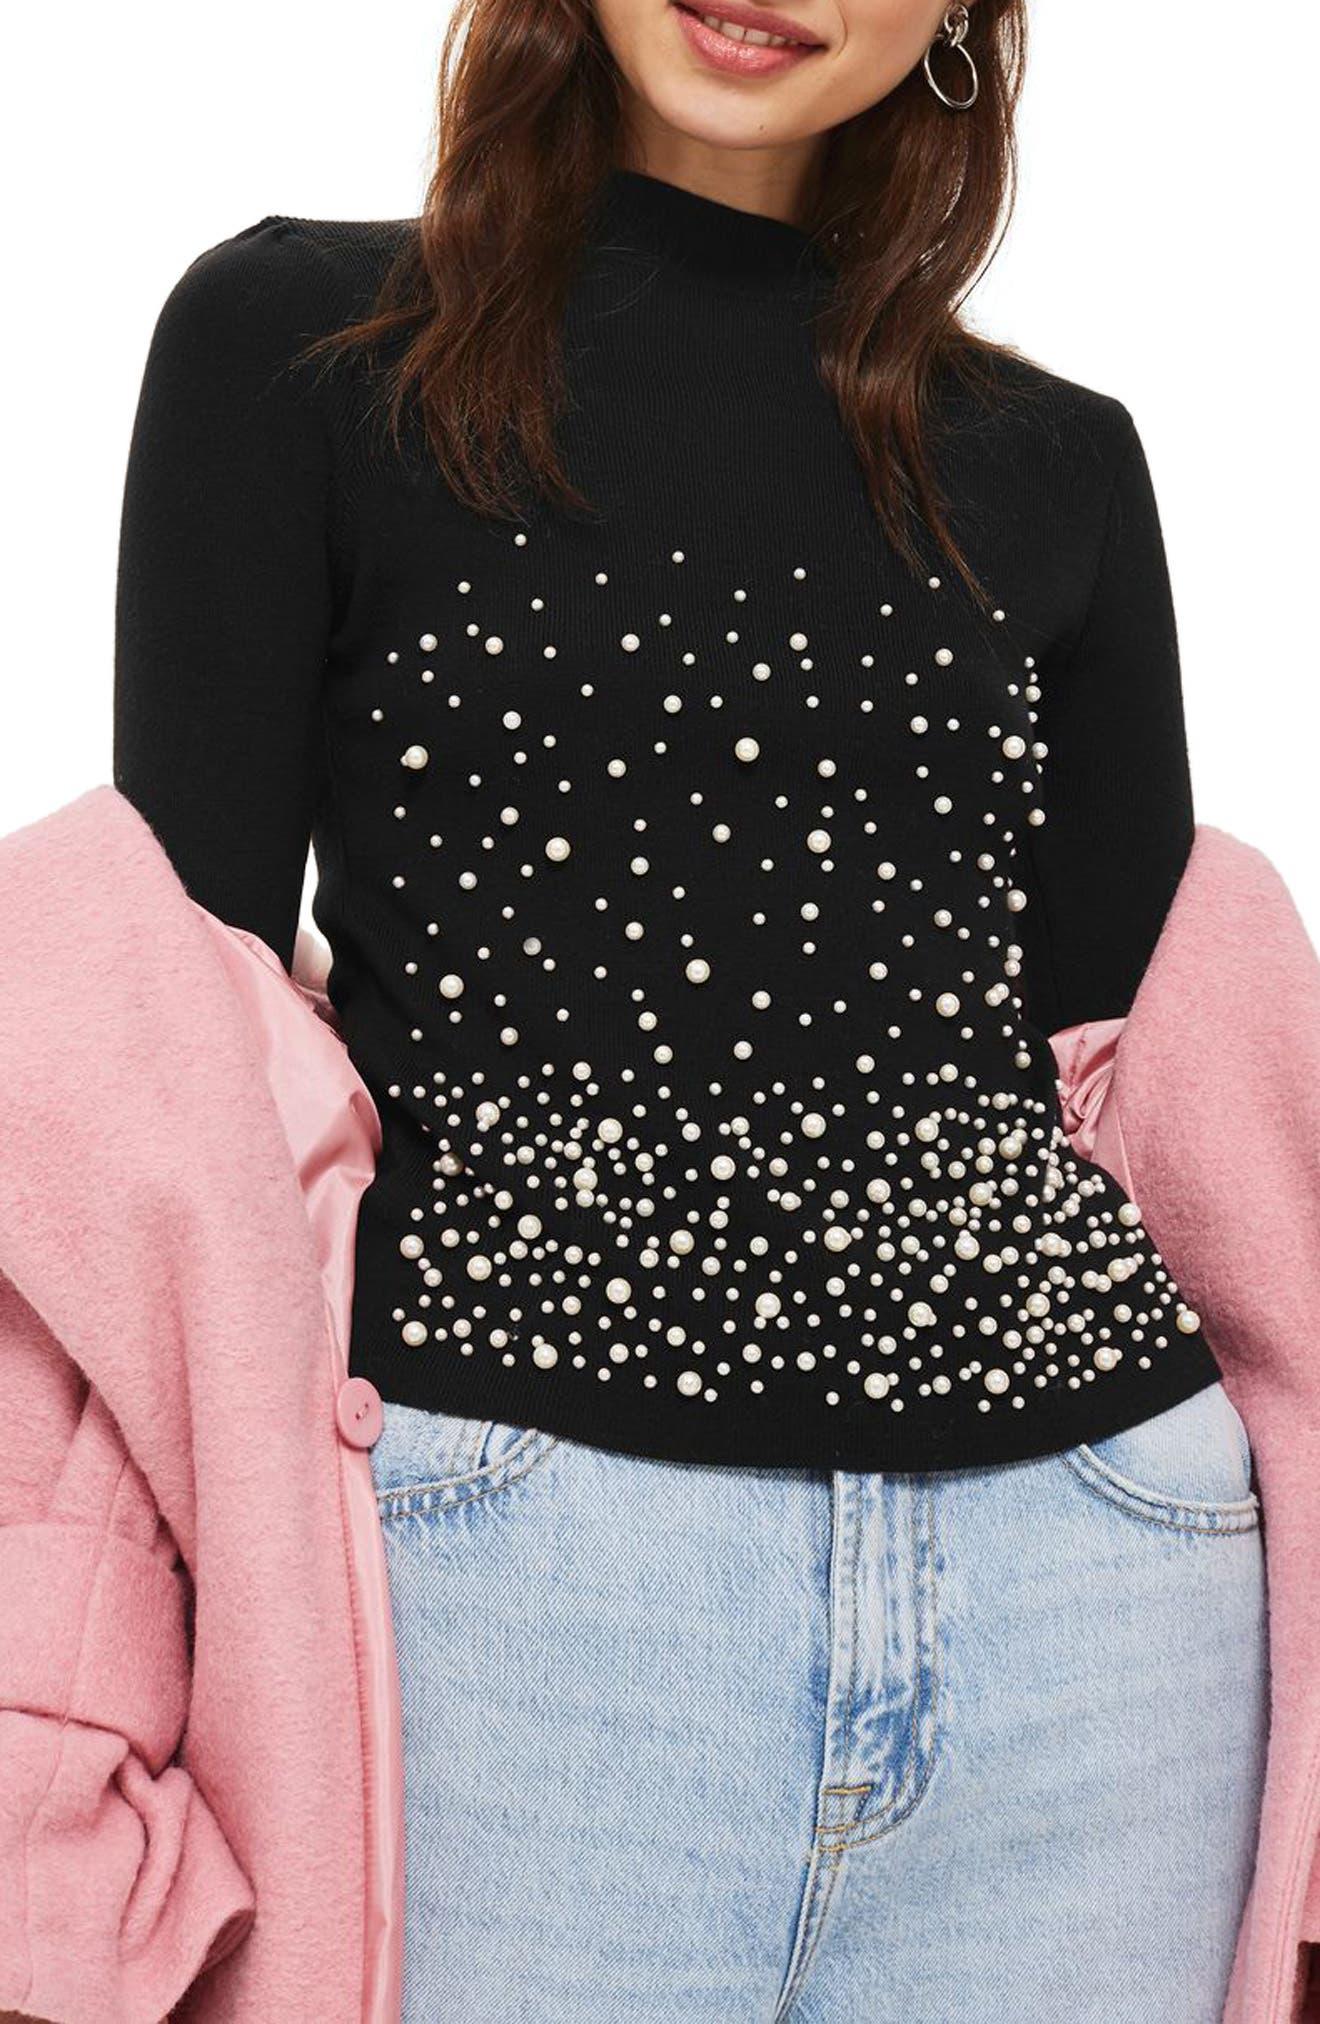 Main Image - Topshop Graduated Imitation Pearl Sweater